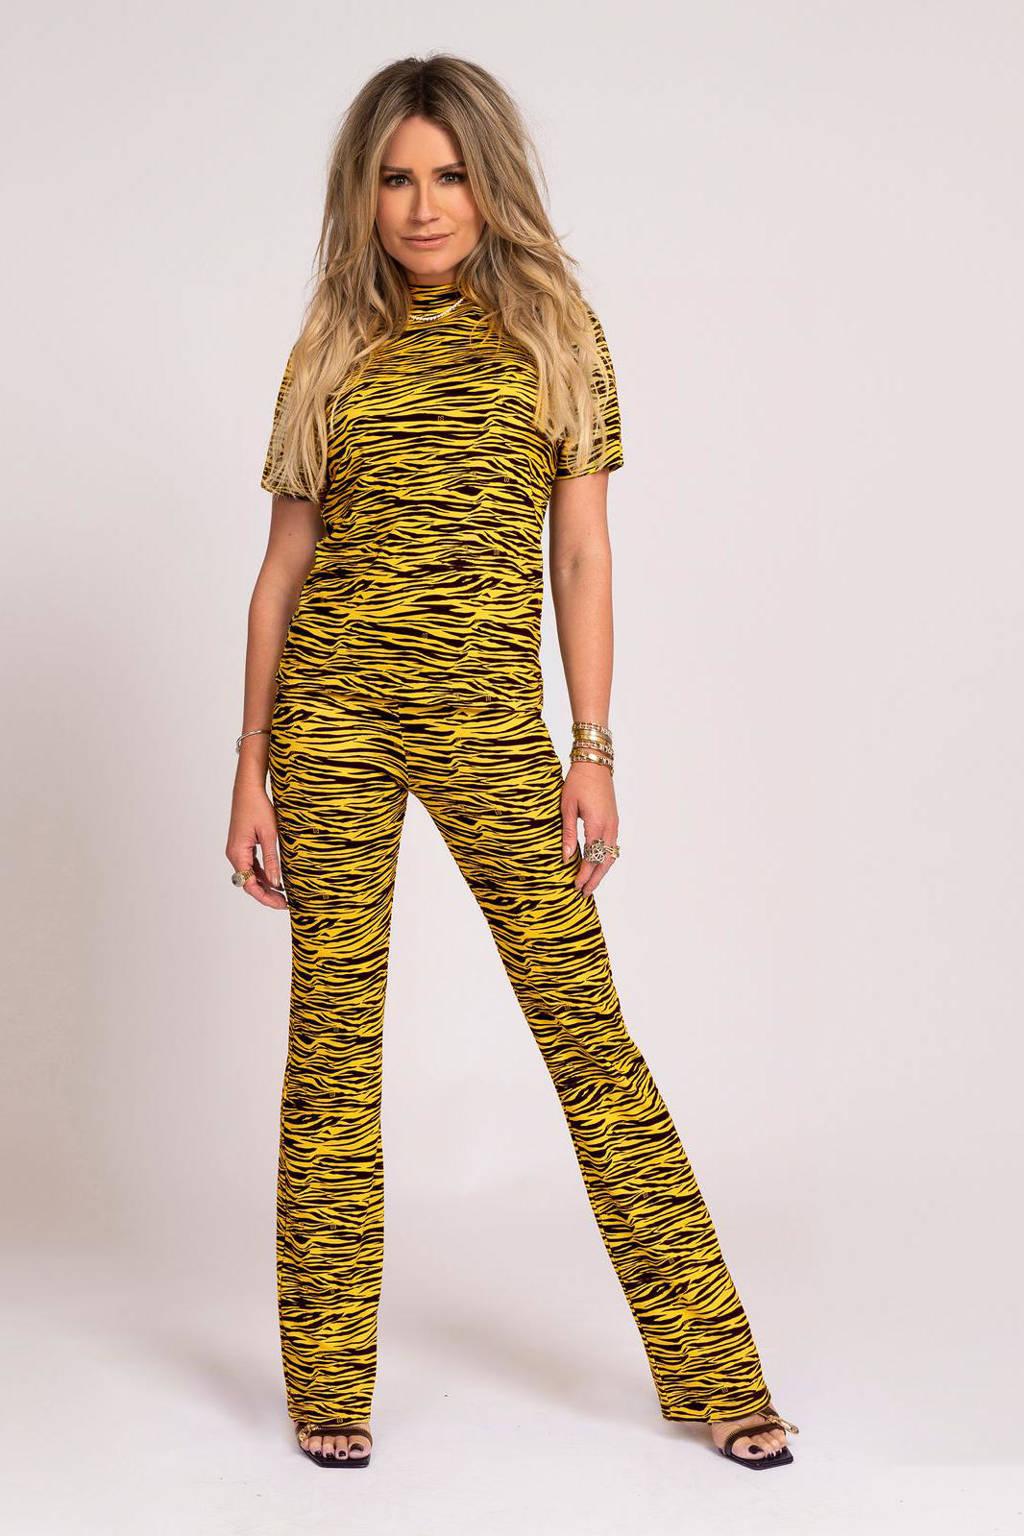 NIKKIE Selected By Kate Moss top Tiger met dierenprint geel/ zwart, Geel/ zwart